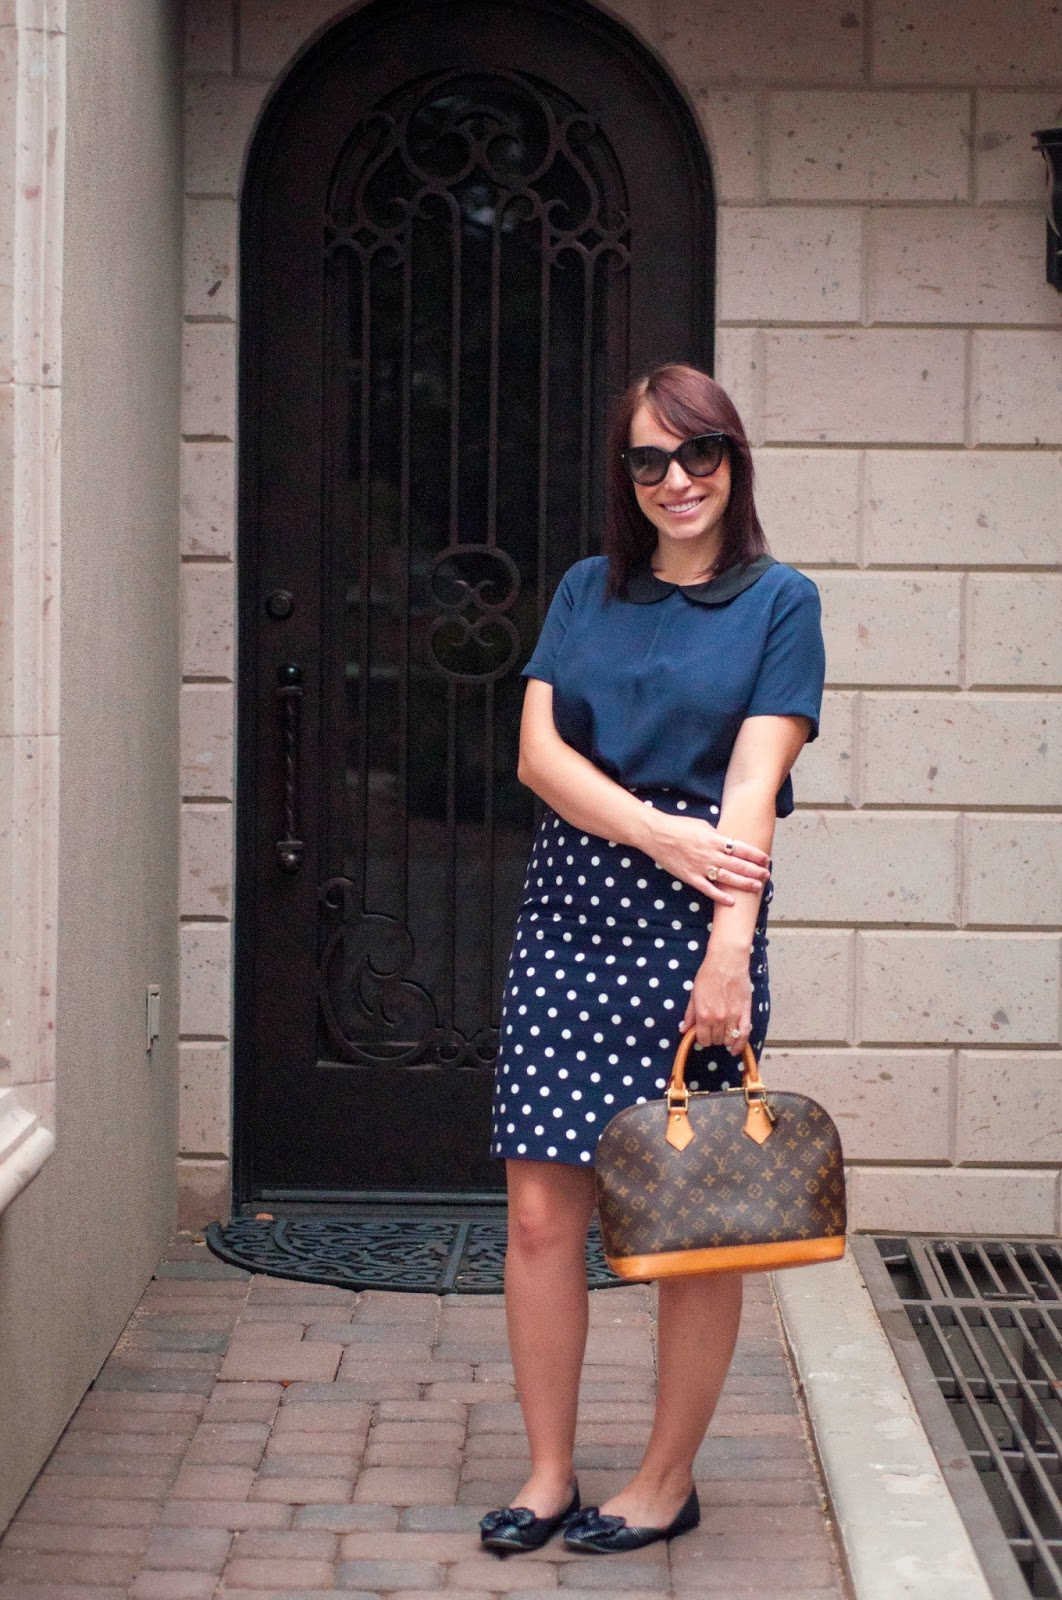 prada cats eye sunglasses, prada, louis vuitton alma, bow flats, target style, peter pan collar, polka dot skirt